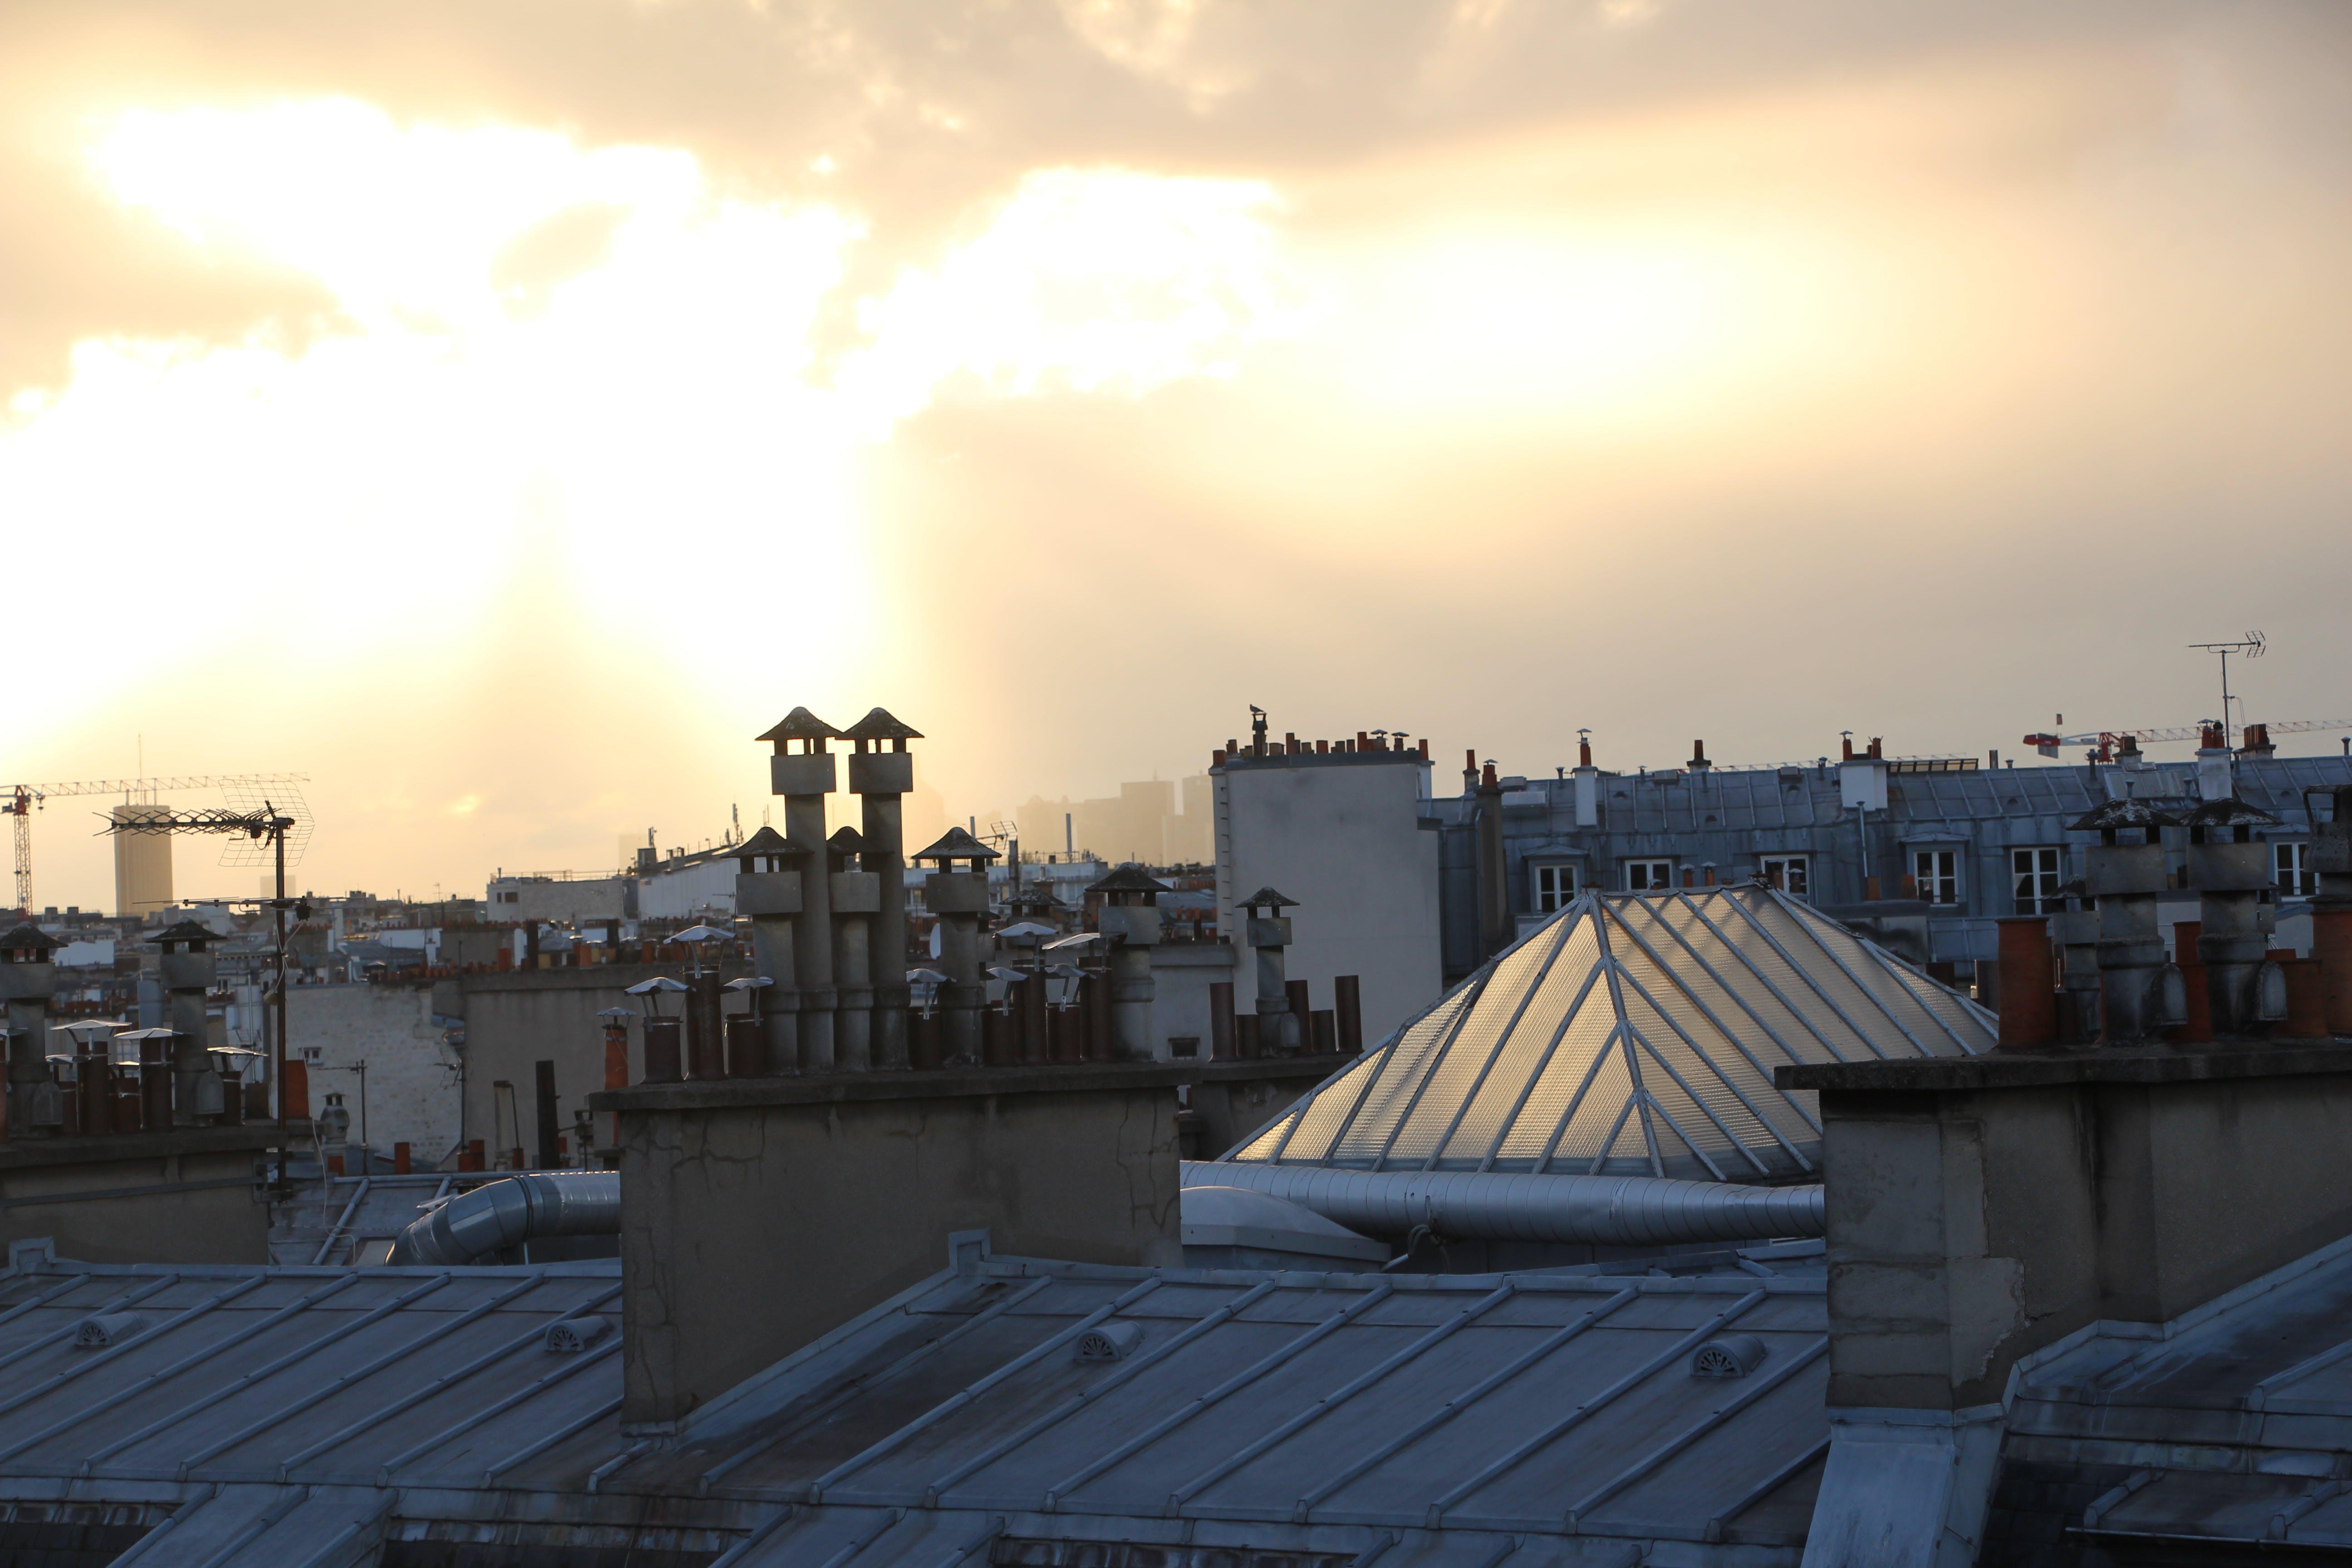 Free stock photo of chimney, city lights, golden sun, paris